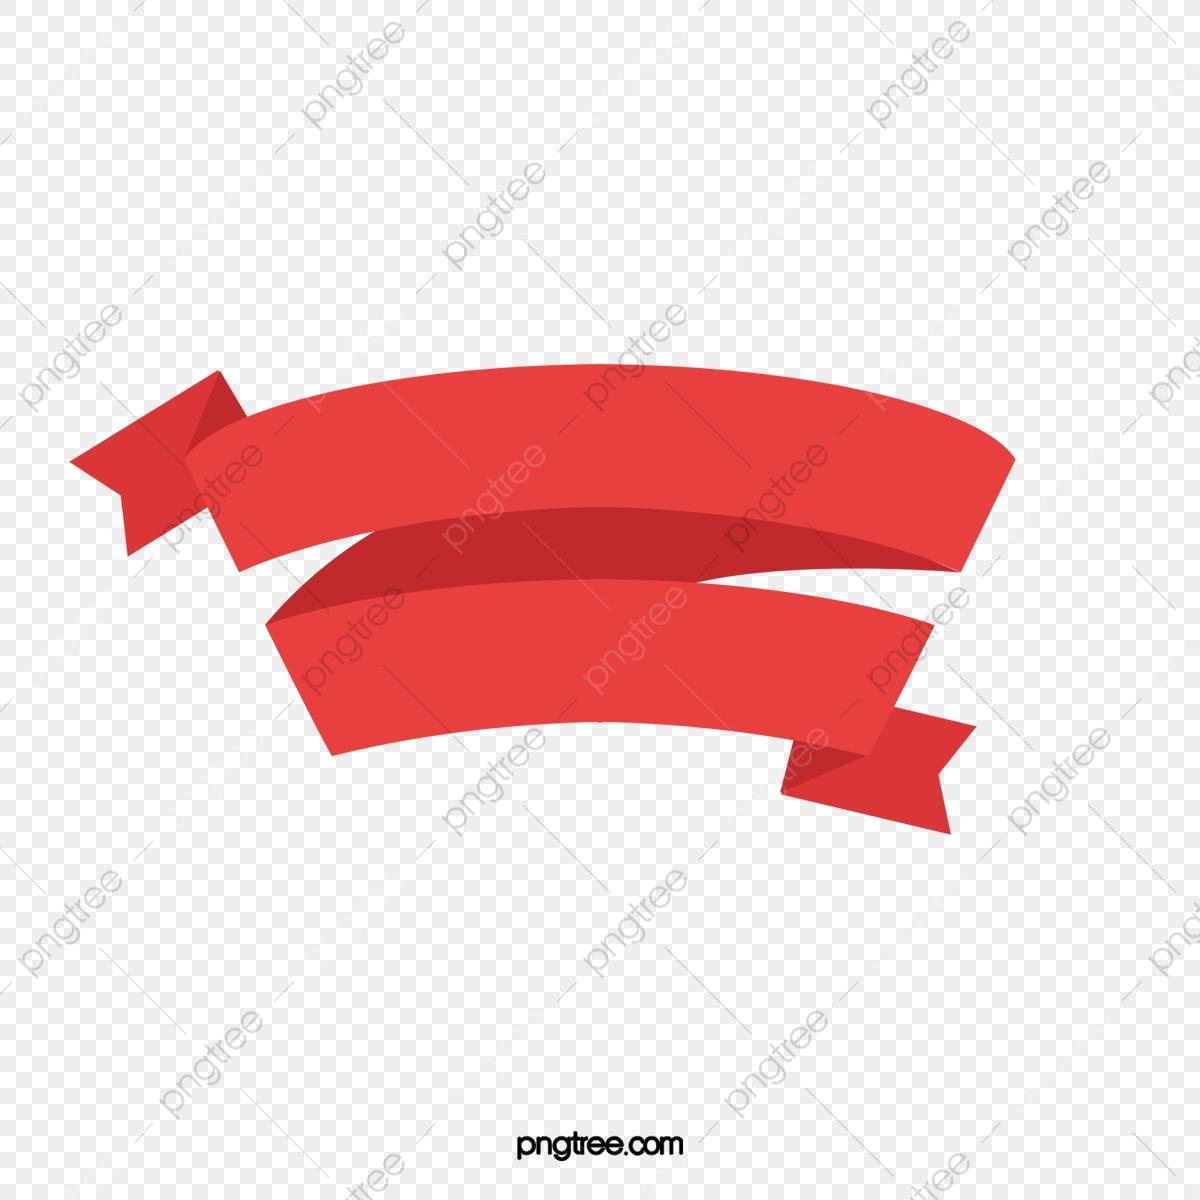 Cartoon Red Ribbon Png Material Frame, Cartoon Clipart, Ribbon.